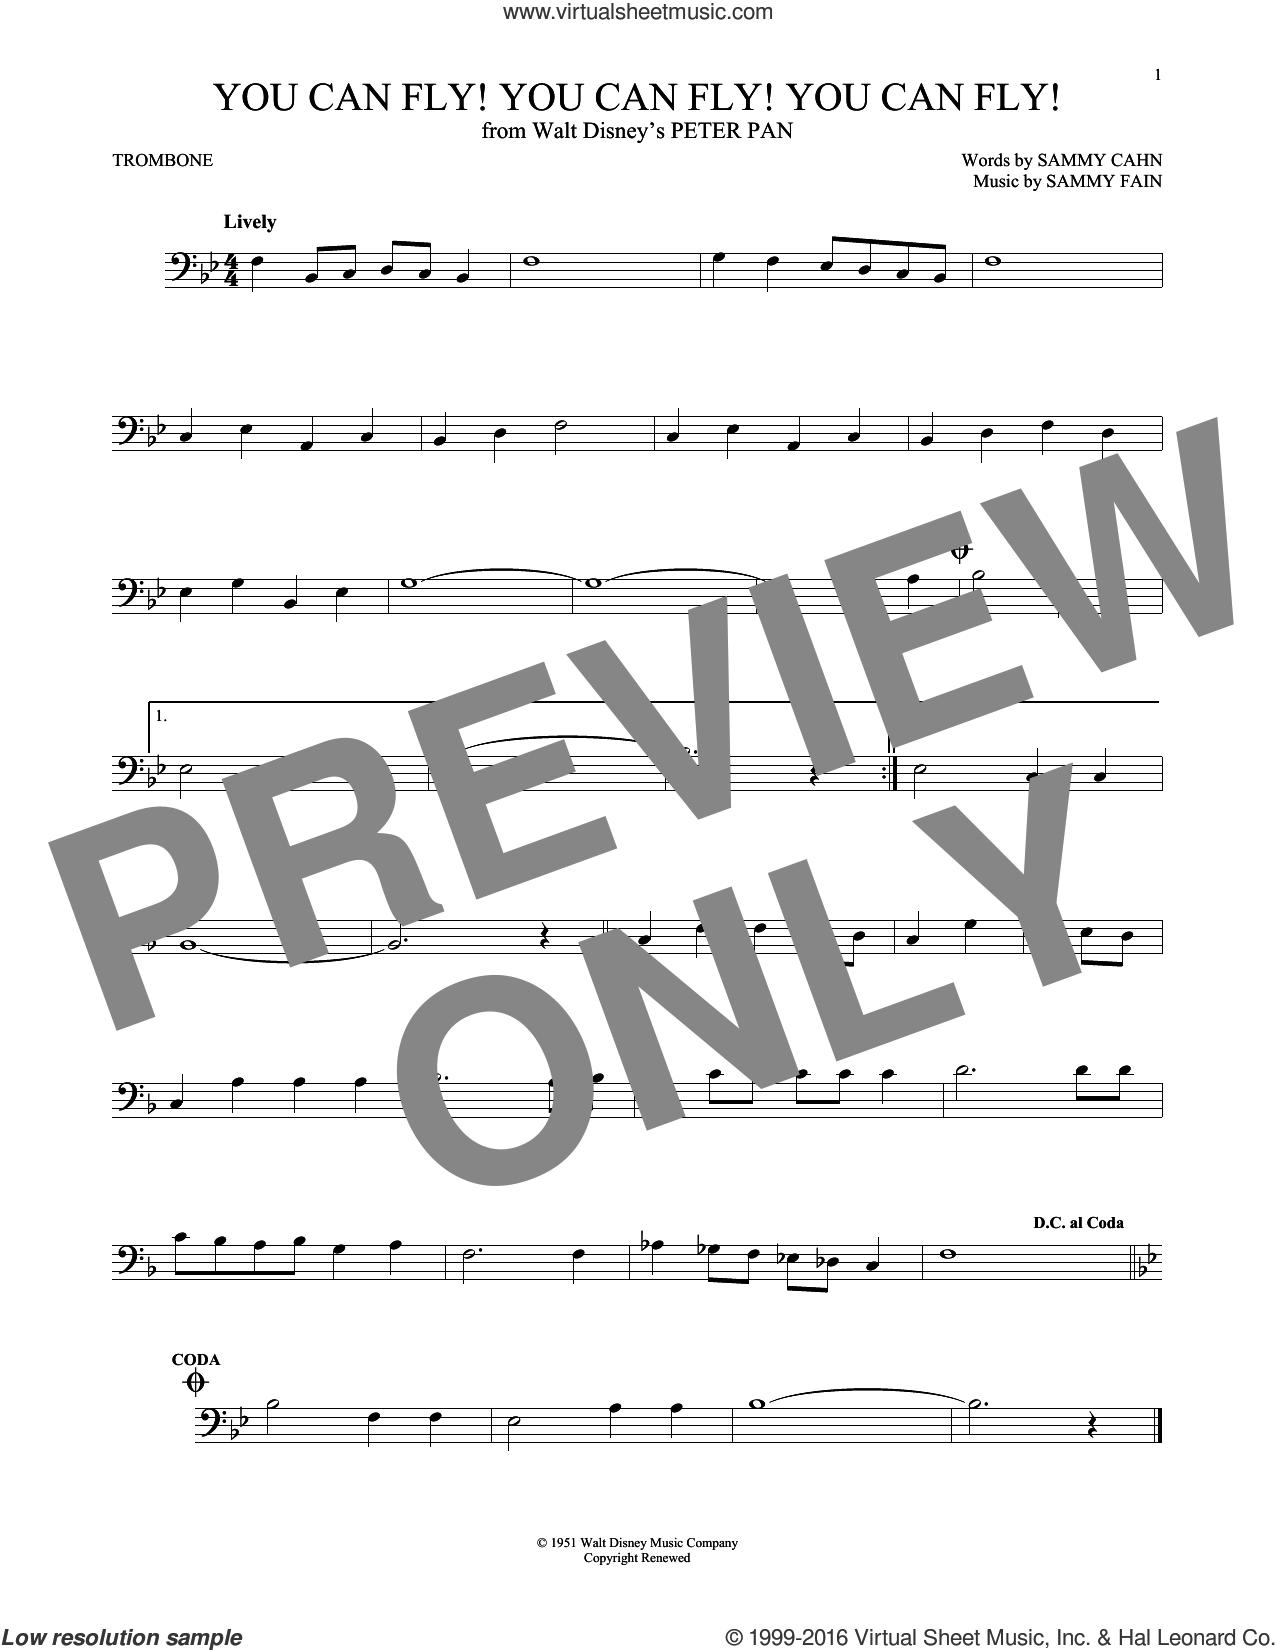 You Can Fly! You Can Fly! You Can Fly! sheet music for trombone solo by Sammy Cahn and Sammy Fain, intermediate skill level